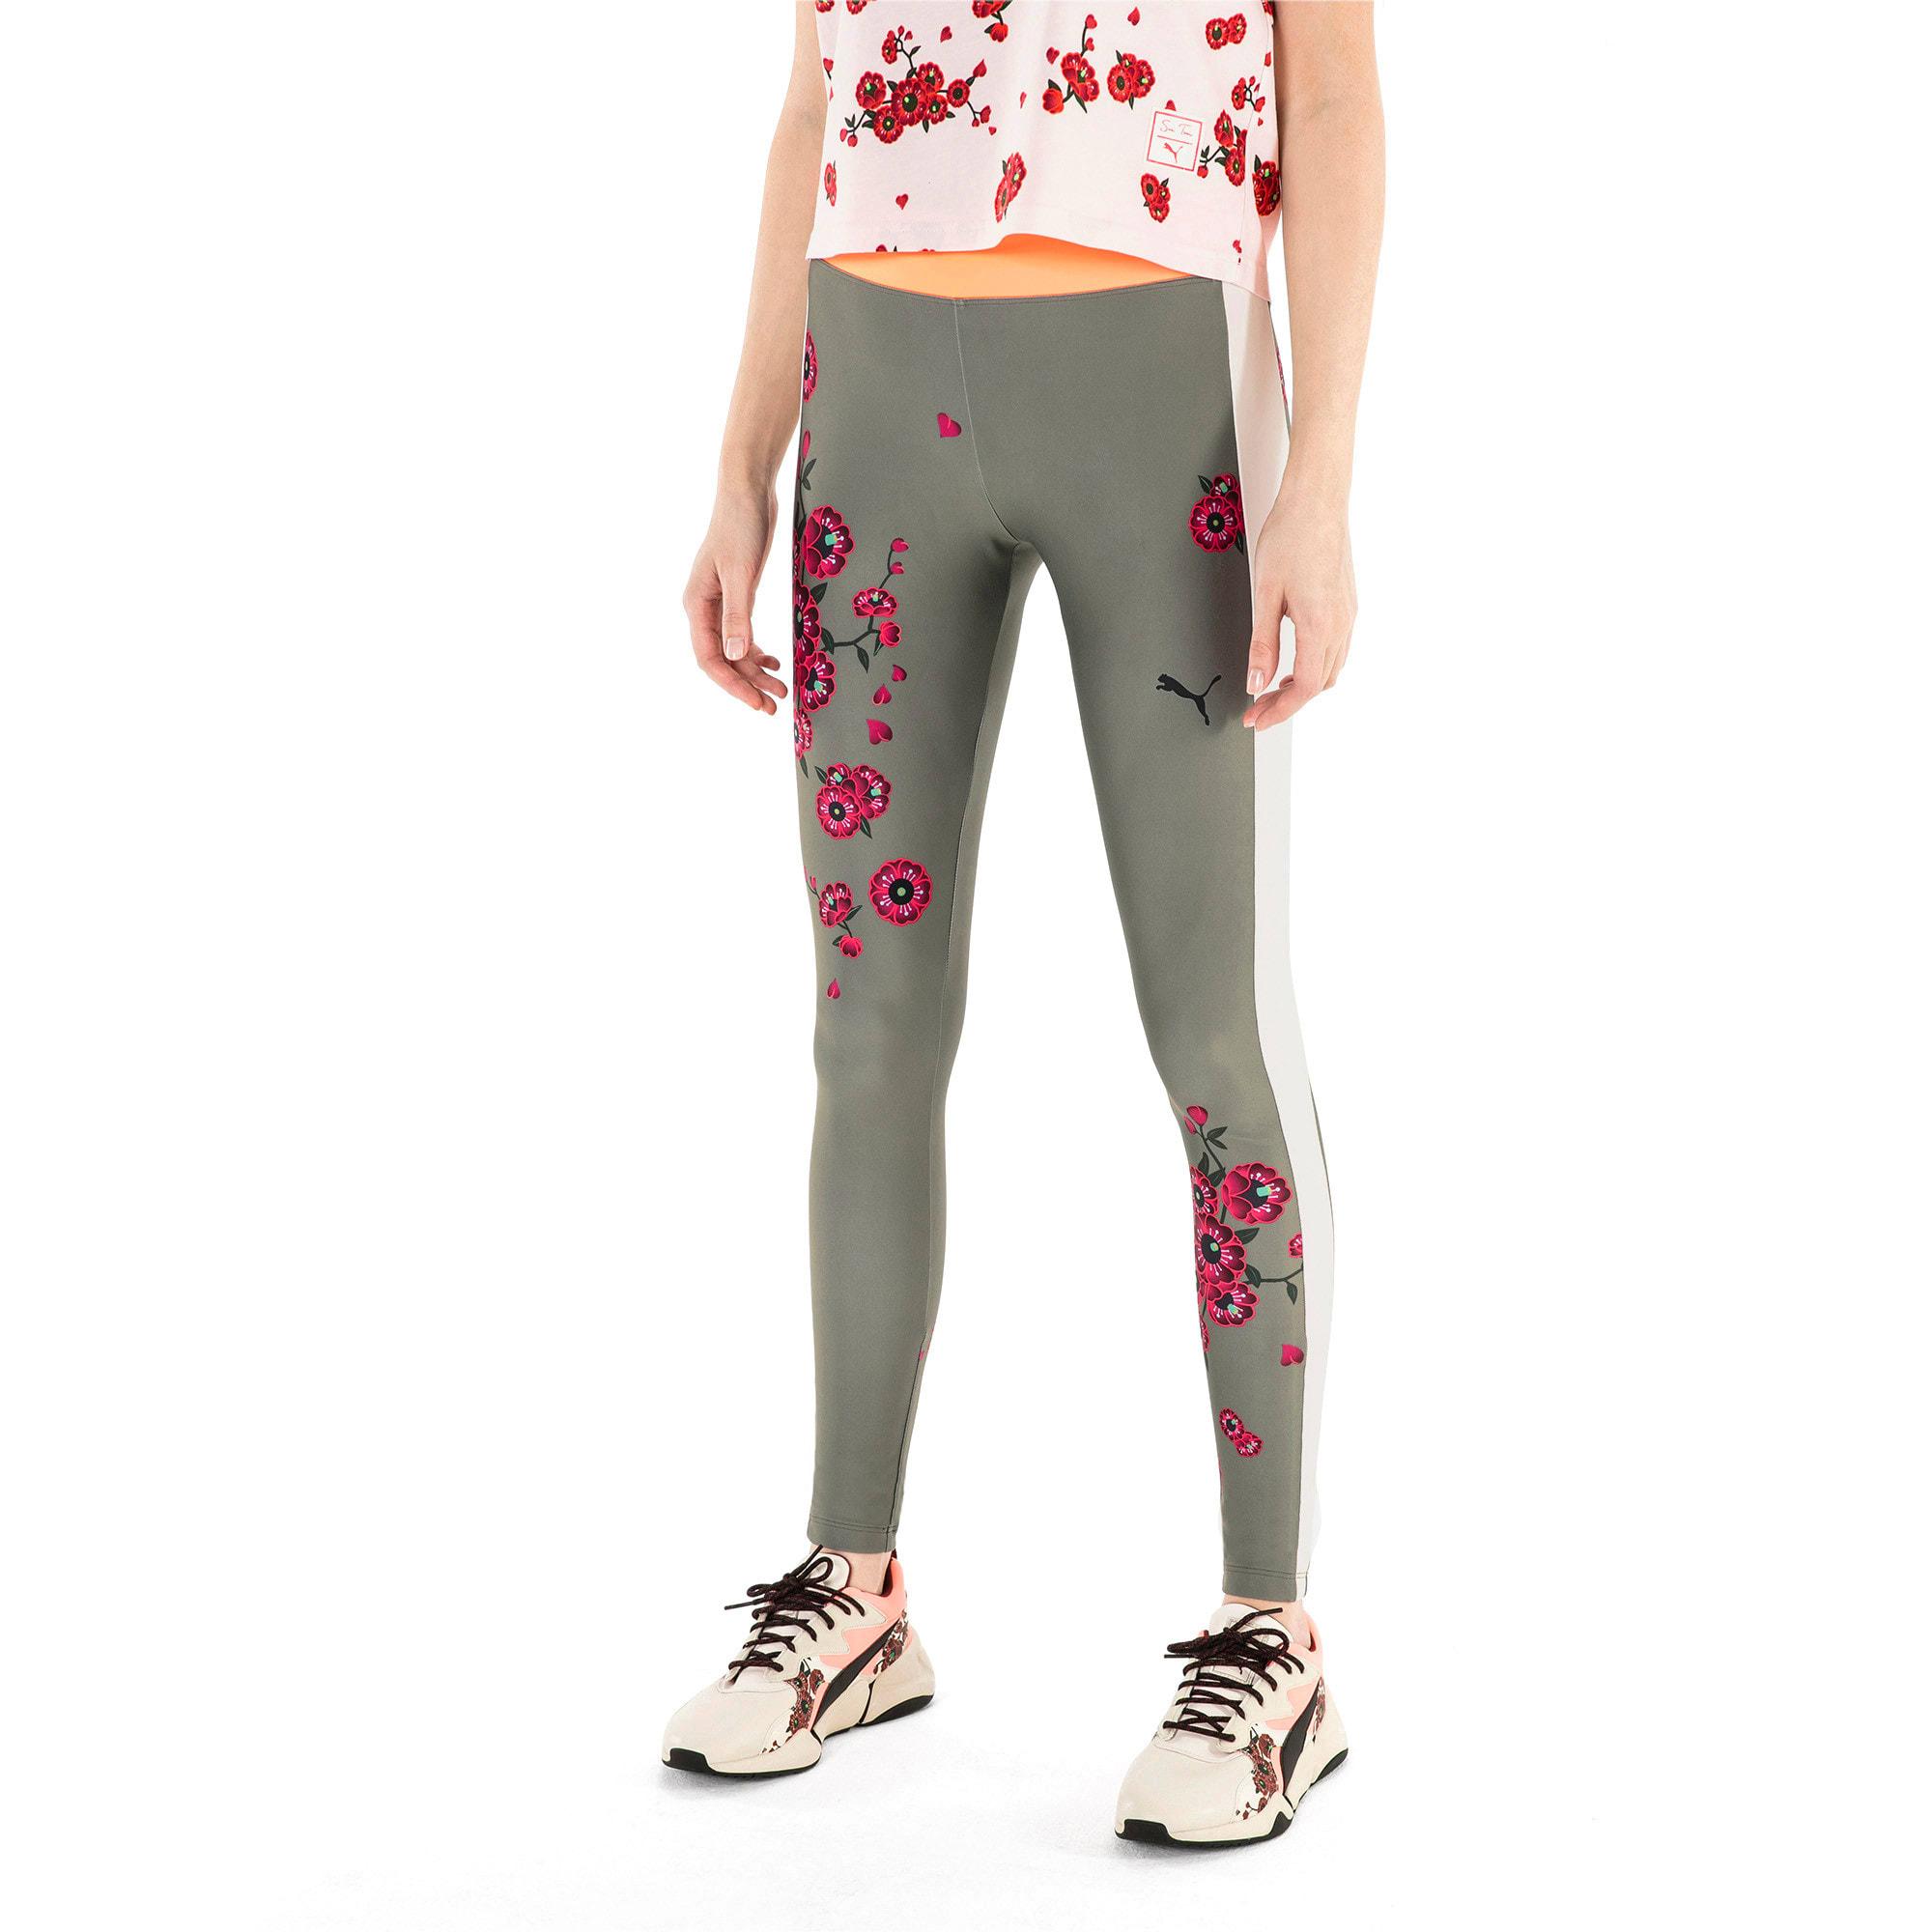 Thumbnail 2 van PUMA x SUE TSAI Blossom legging voor vrouwen, -Olivine, medium